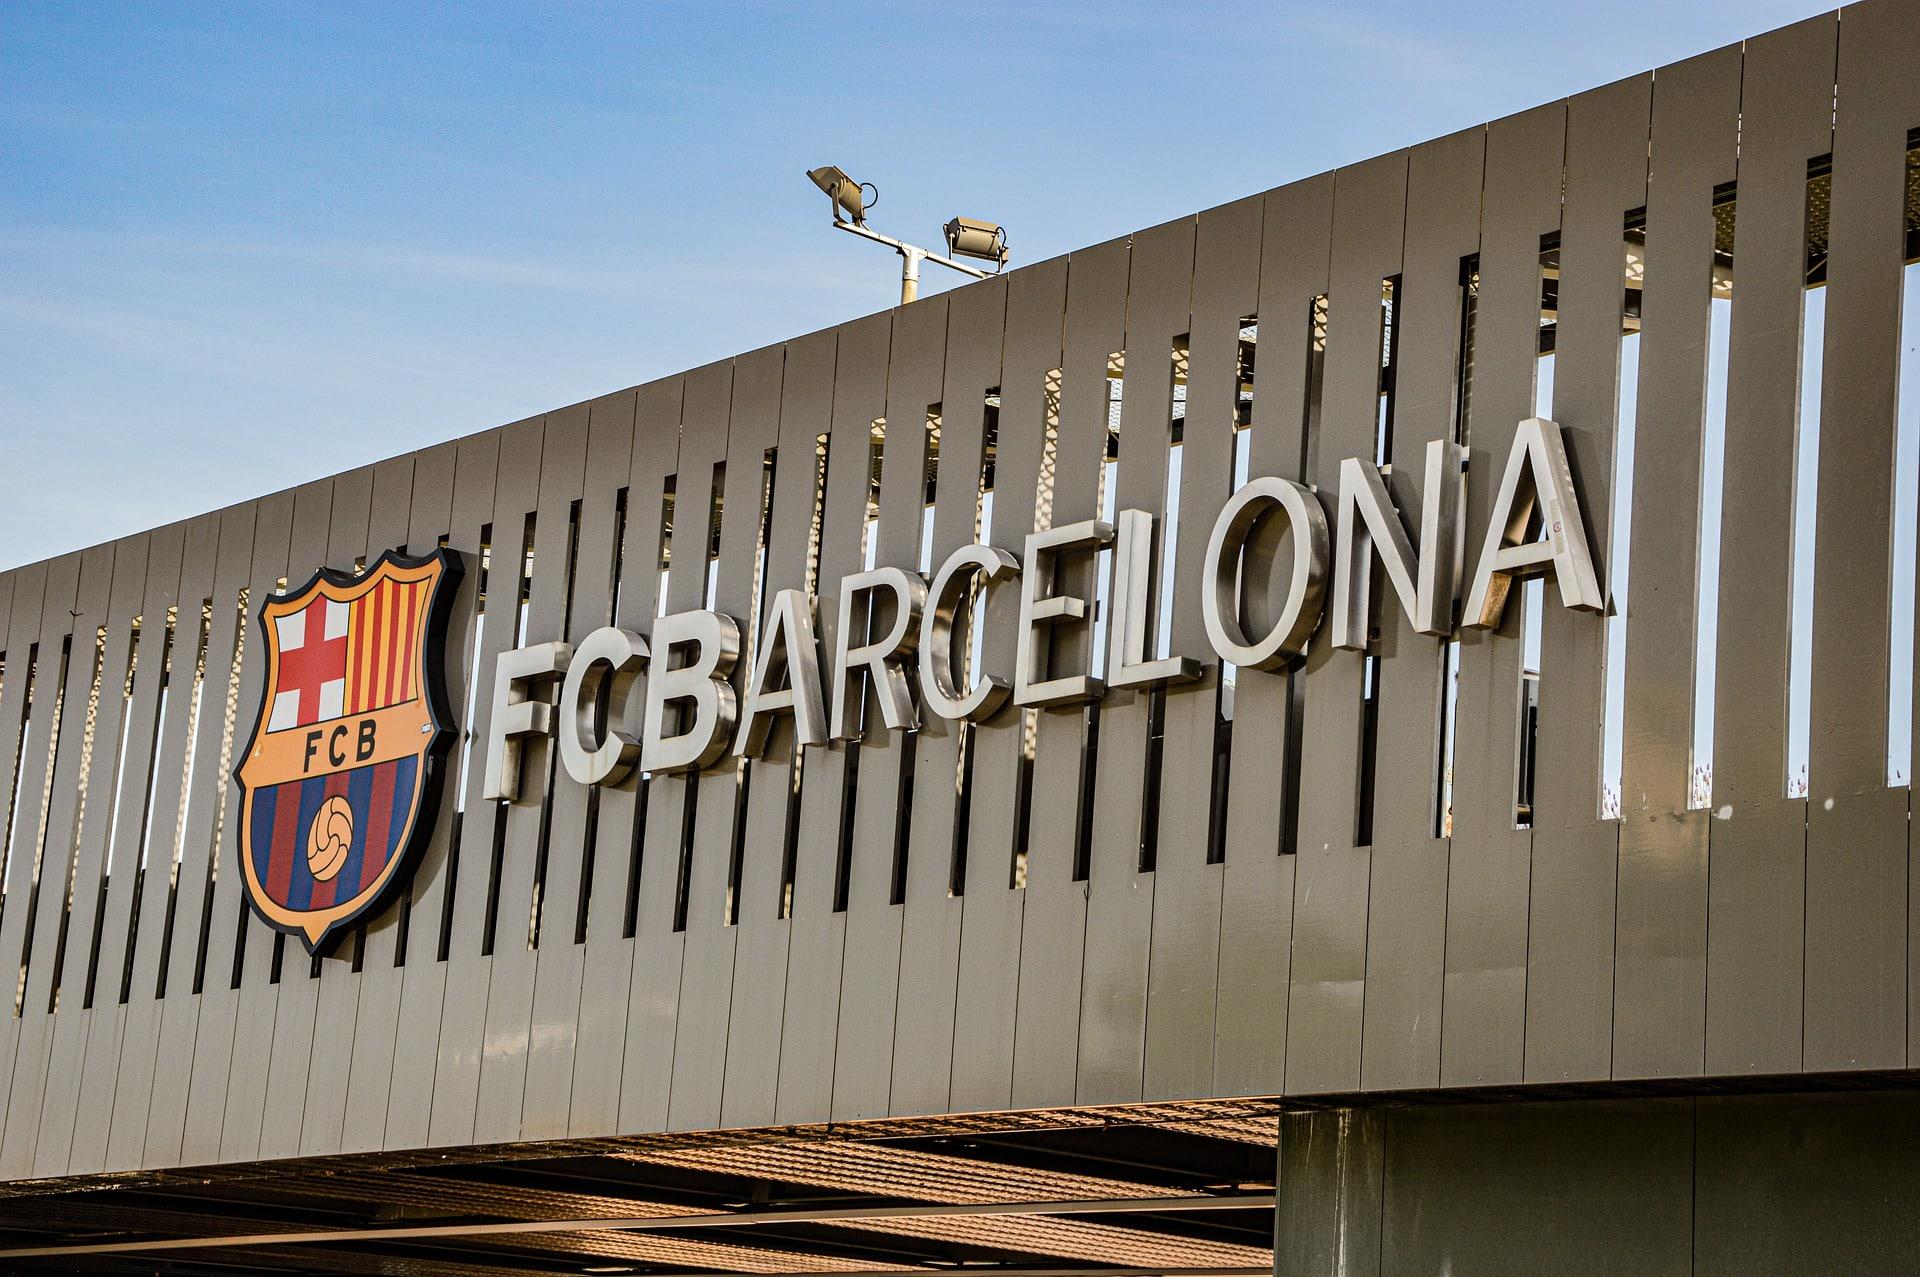 10/03/2021 Daily Predictions: UEFA Champions League – Paris Saint-Germain Vs. Barcelona